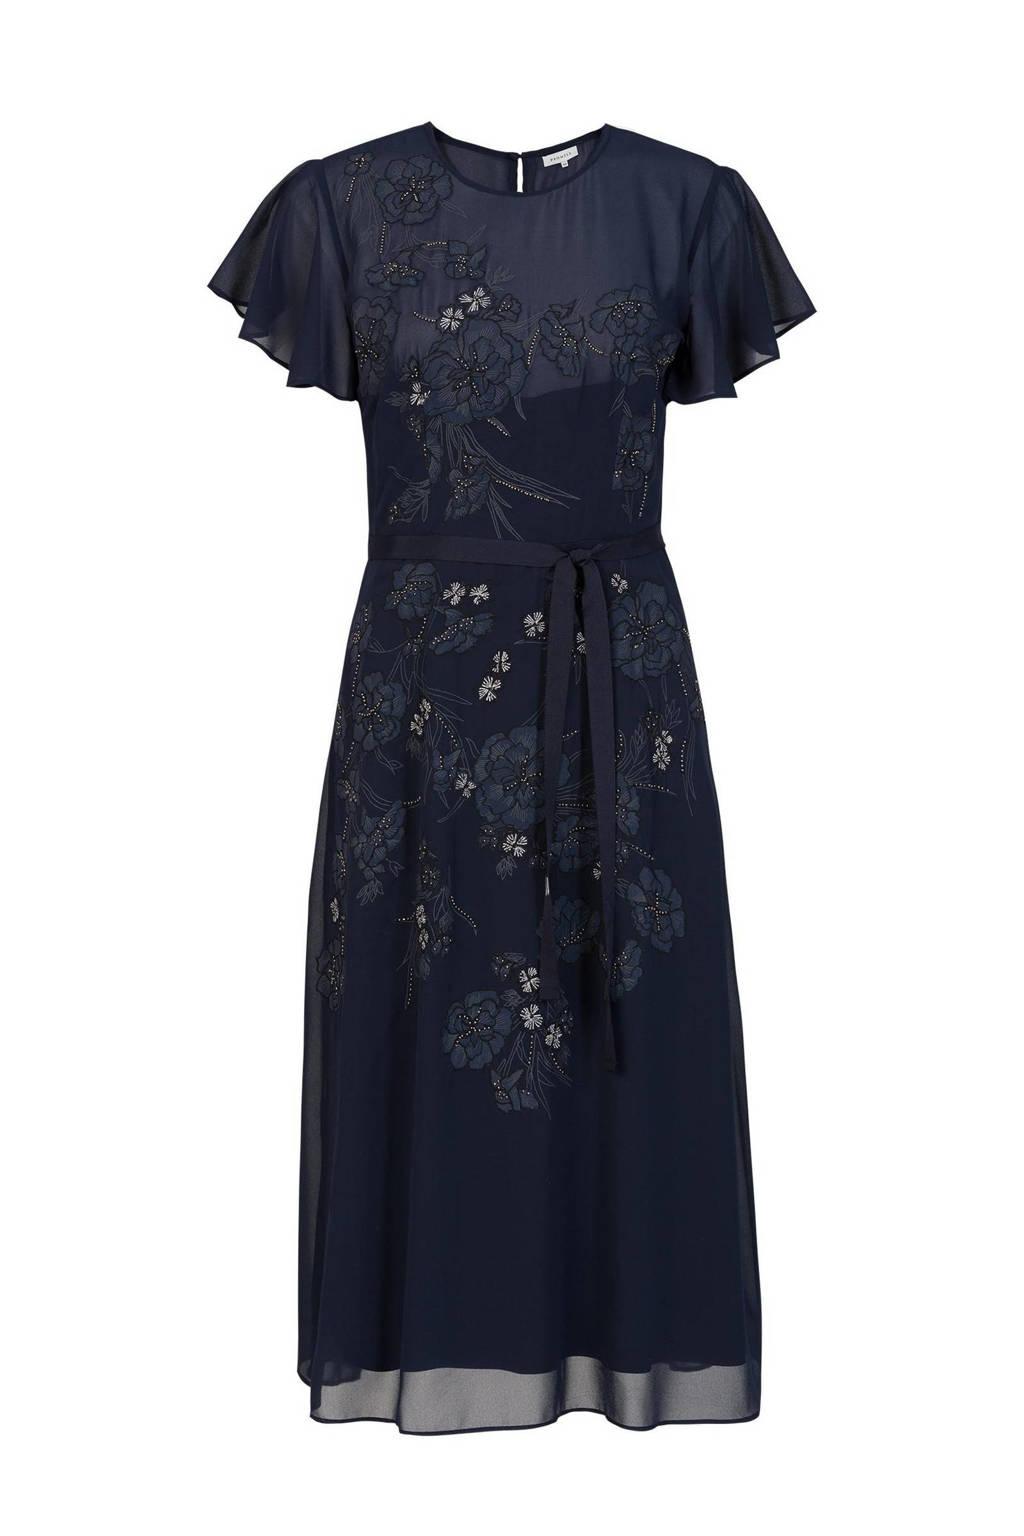 PROMISS semi-transparante maxi jurk met printopdruk en glitters donkerblauw, Donkerblauw